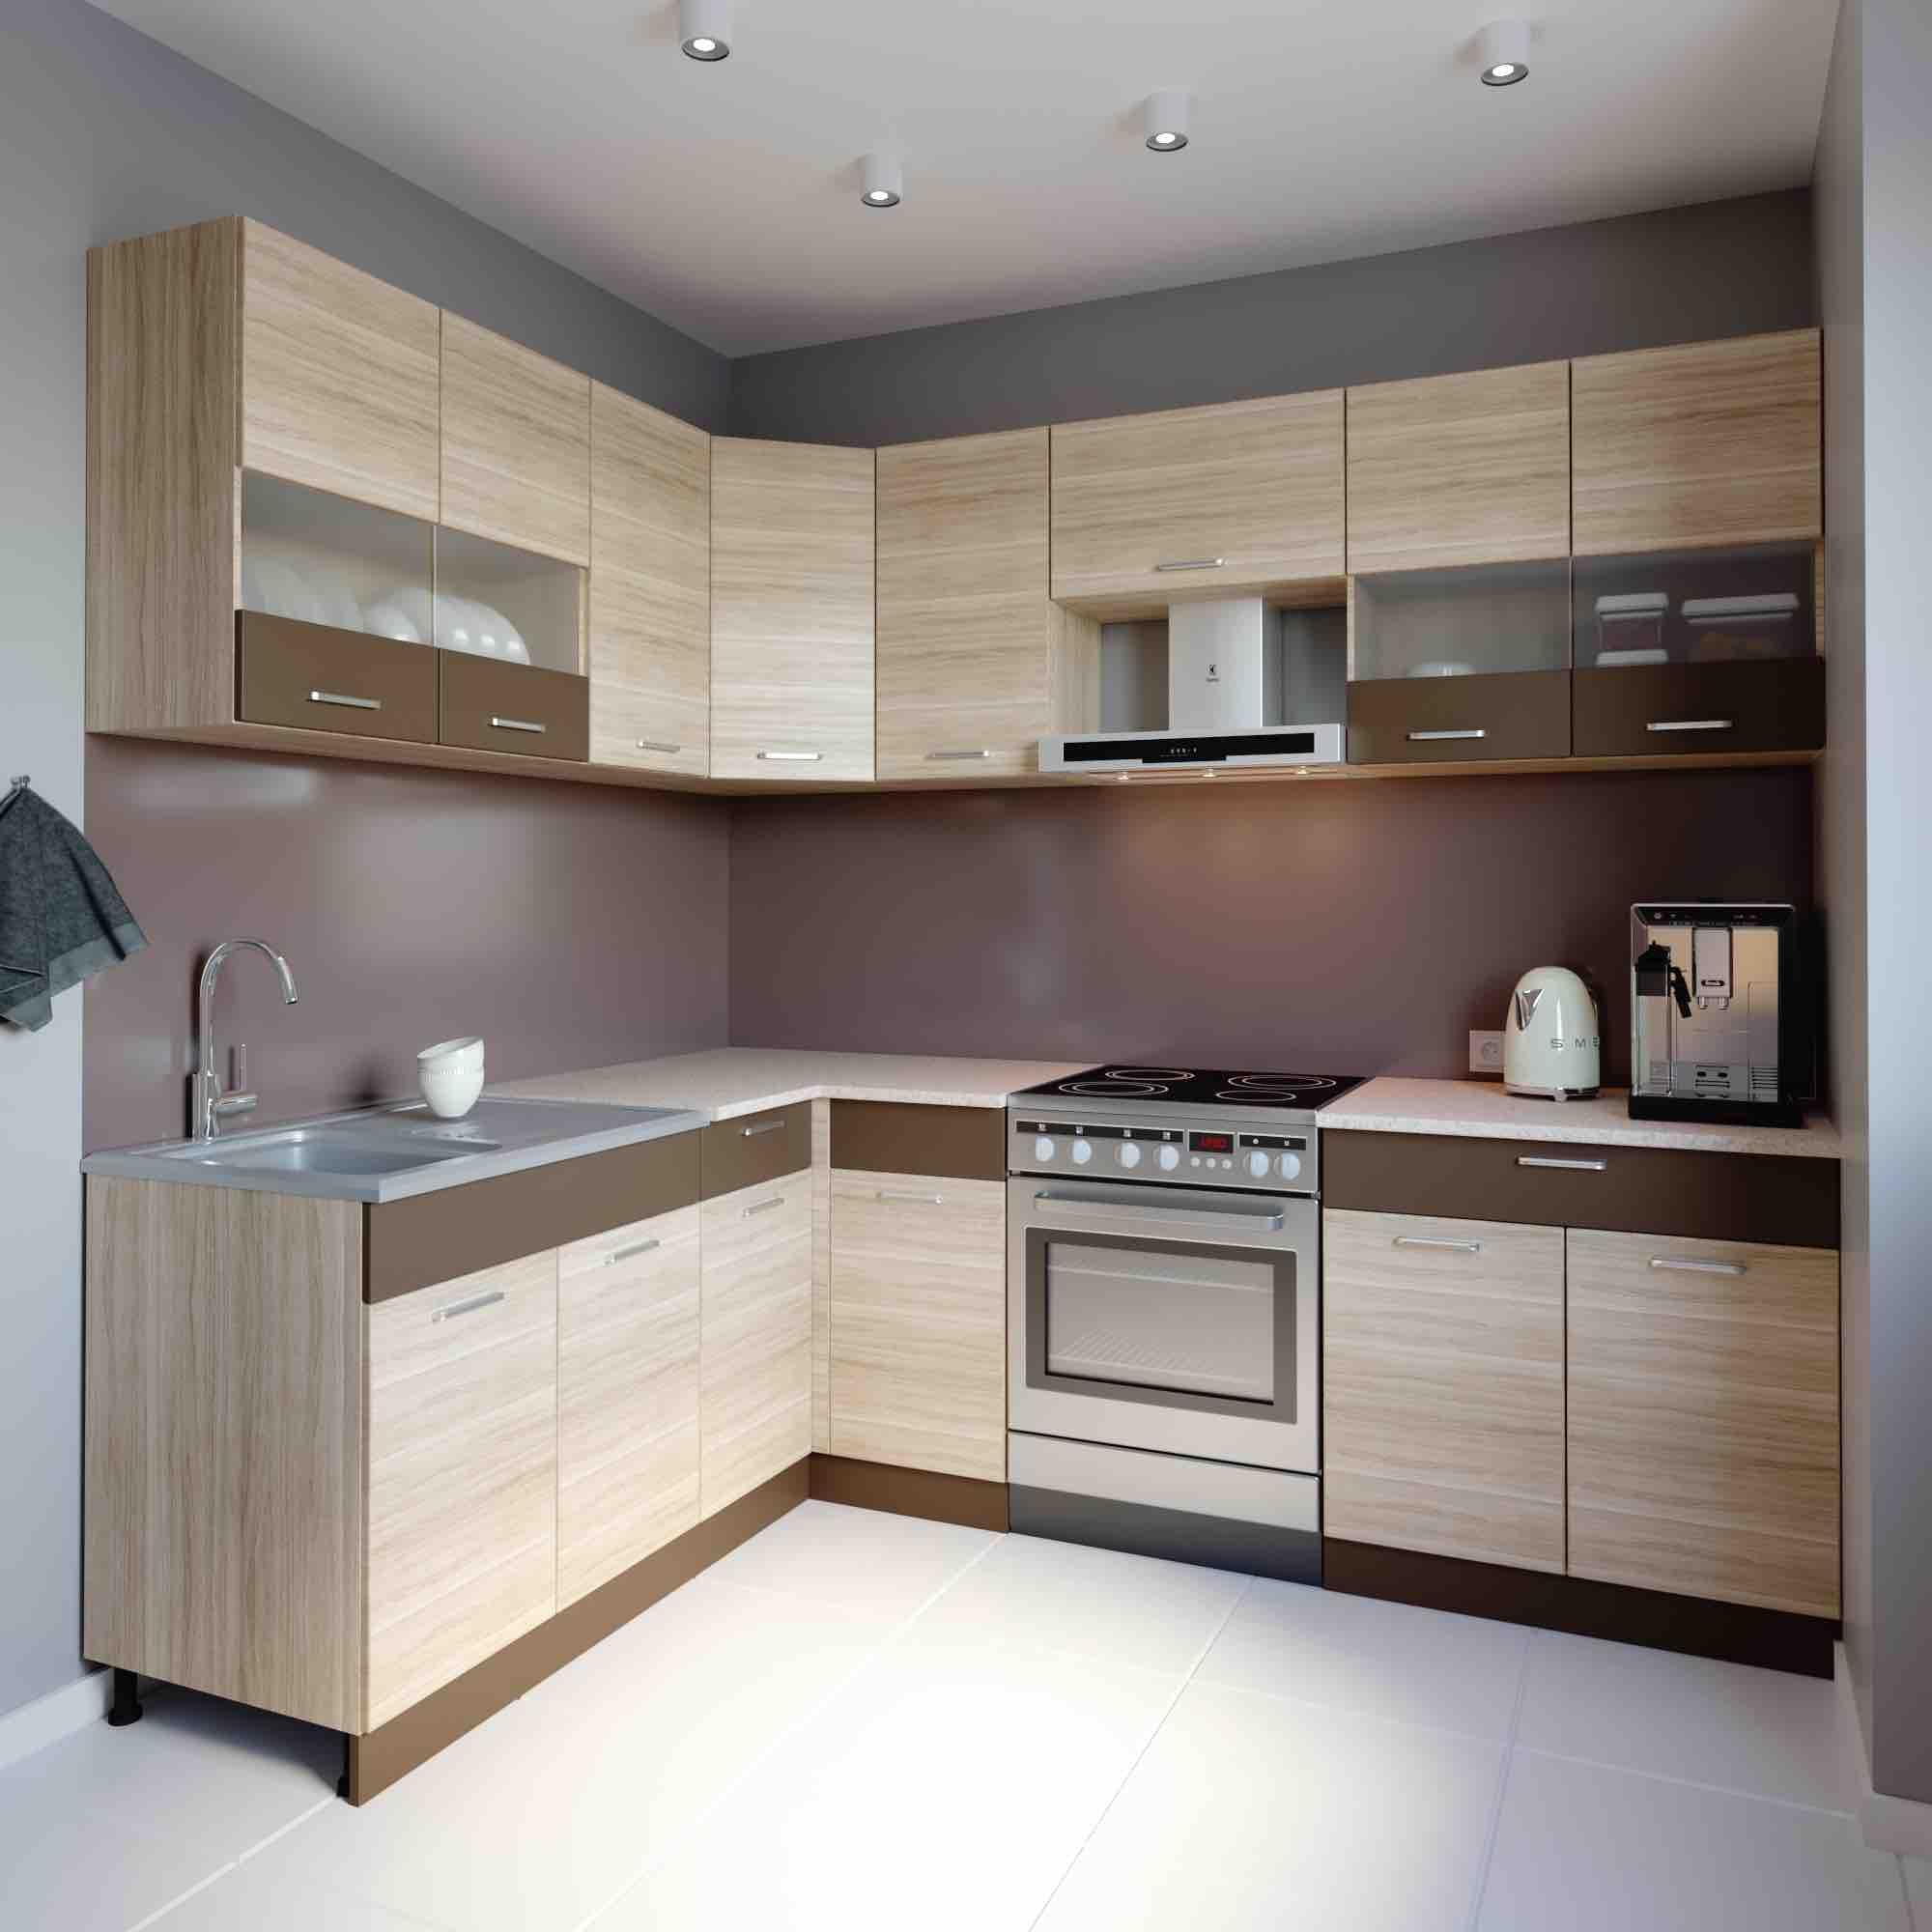 Küche L-Form ALINA 180x240 cm